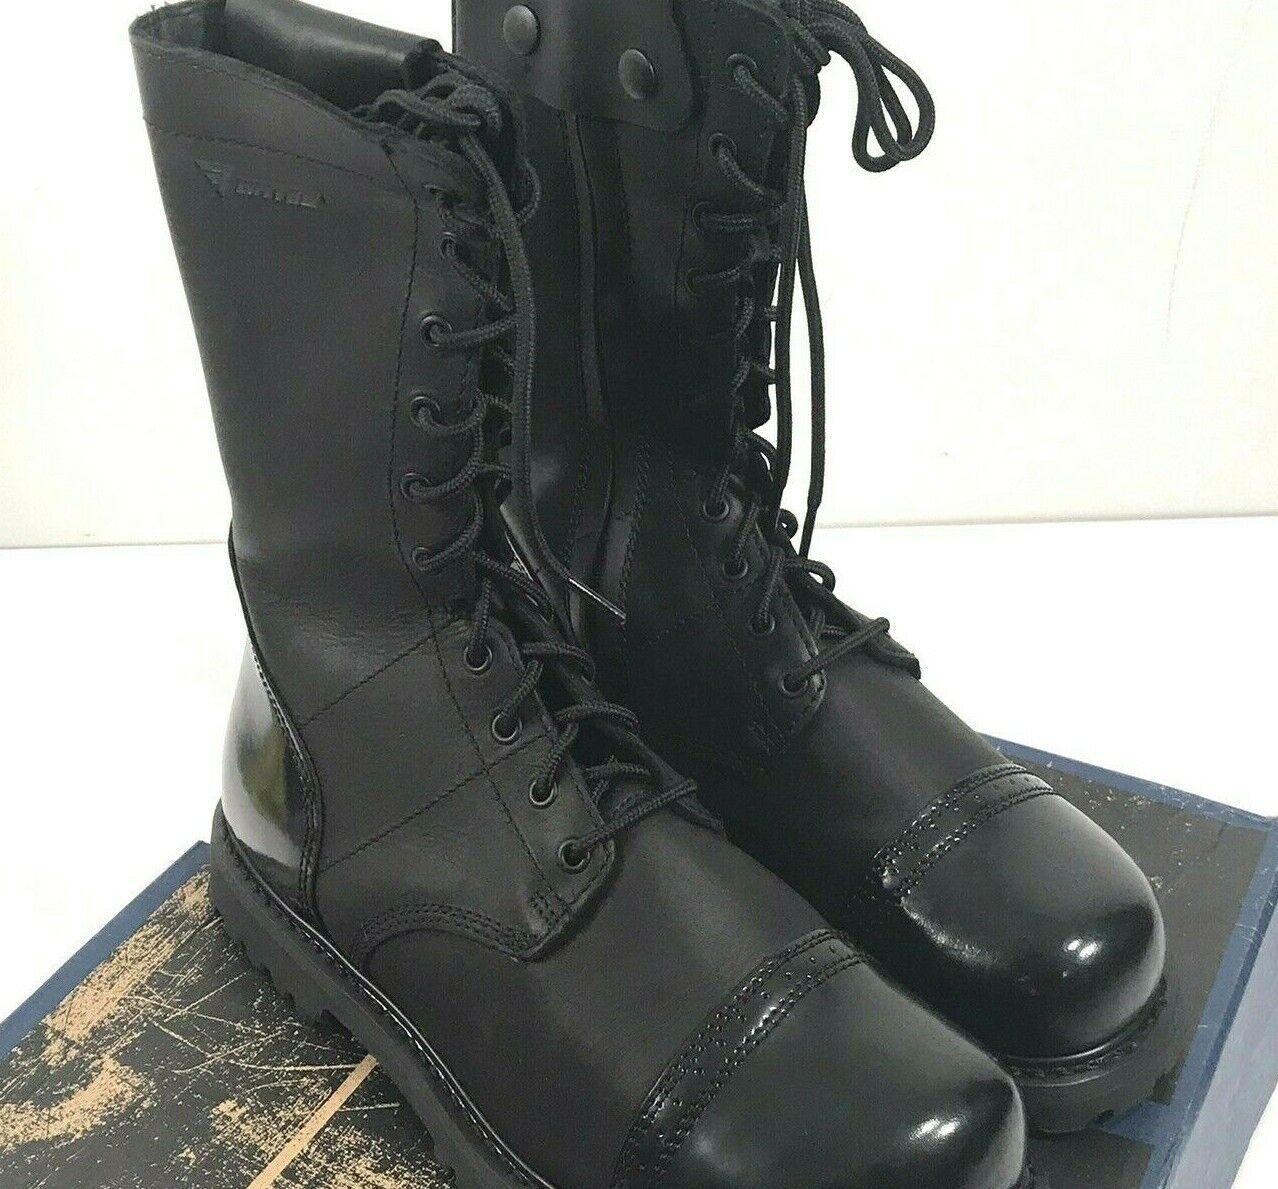 NIB herren BATES E02184 PARATROOPER 11  SIDE ZIP Stiefel schwarz 11.5 W